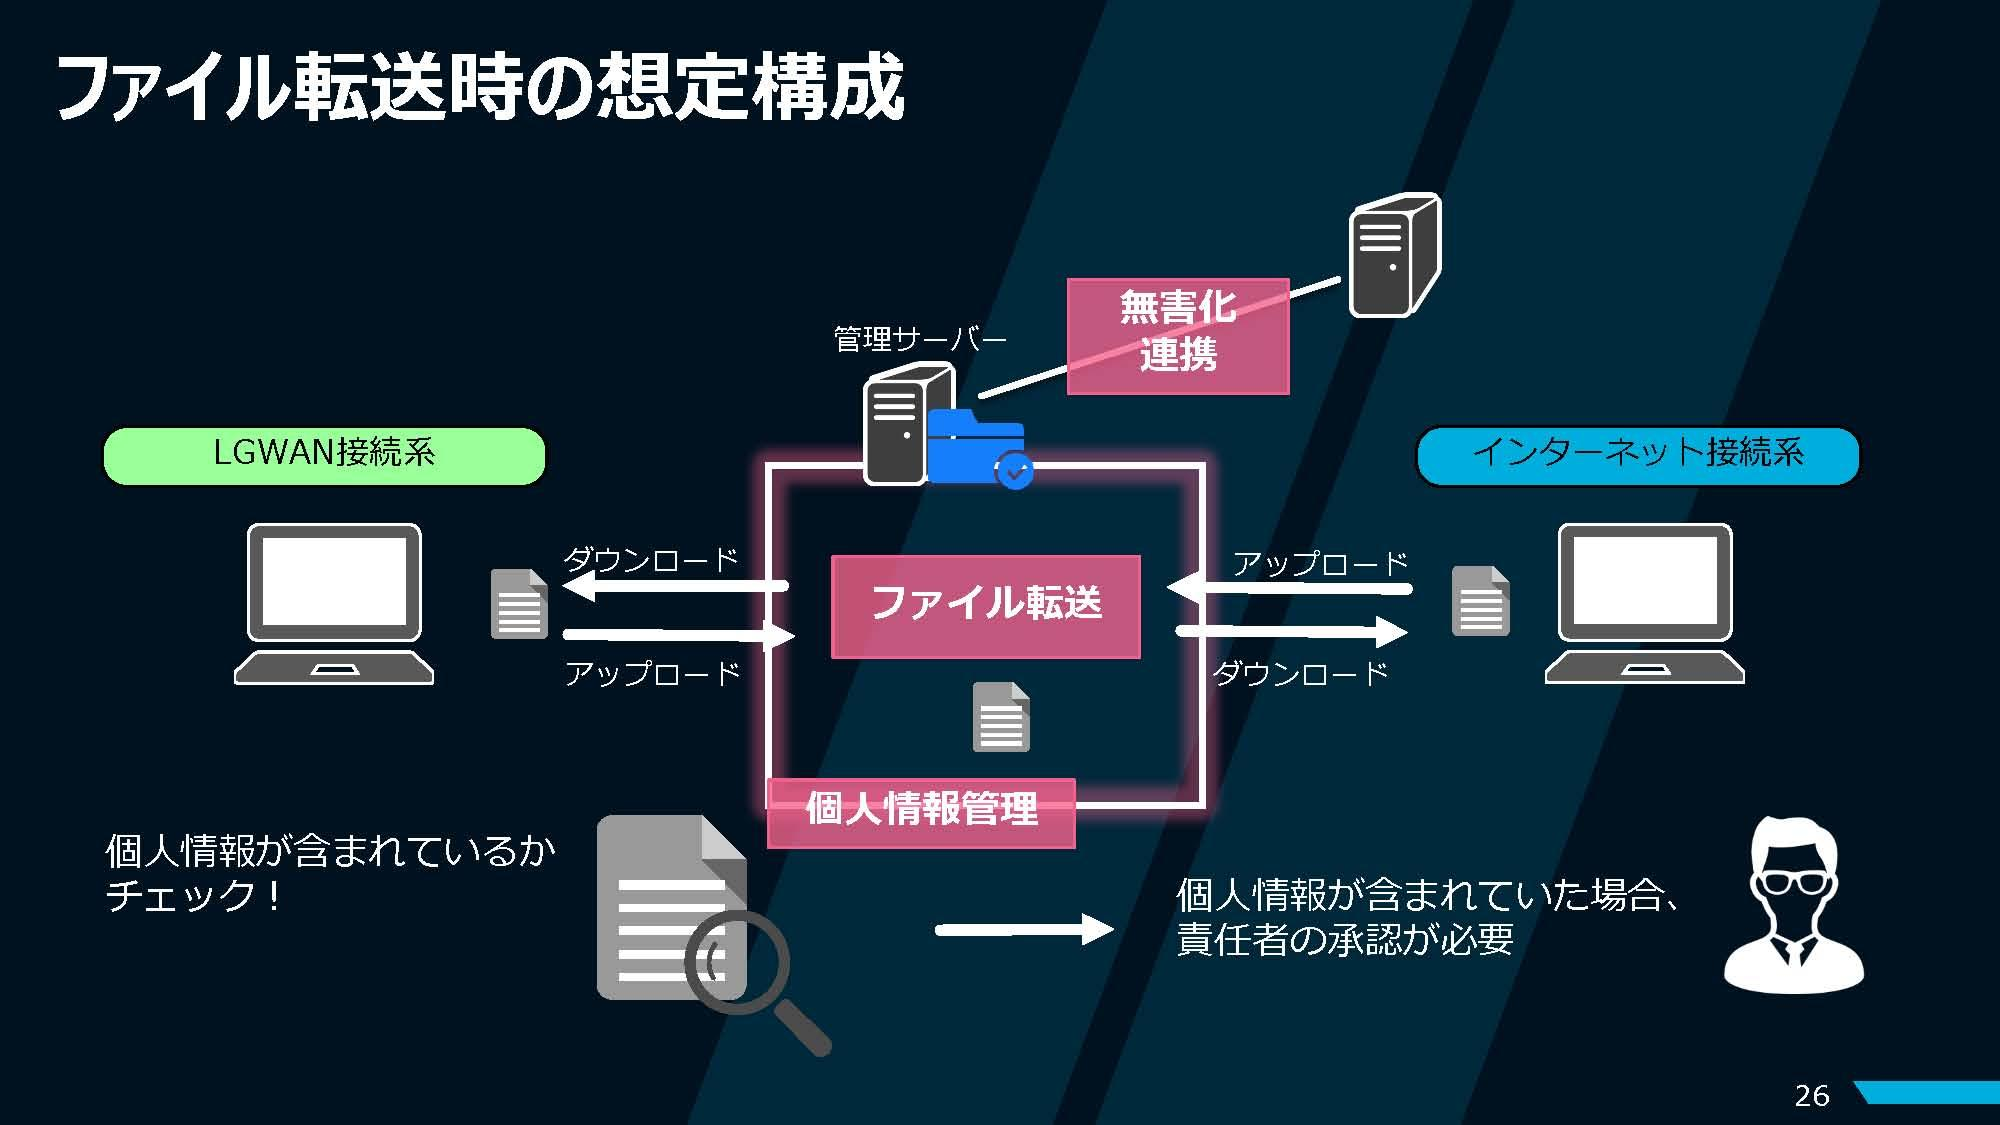 C:\Users\lma-Five\Desktop\オーバル セミレポ\採用画像jpg\6-26.jpg